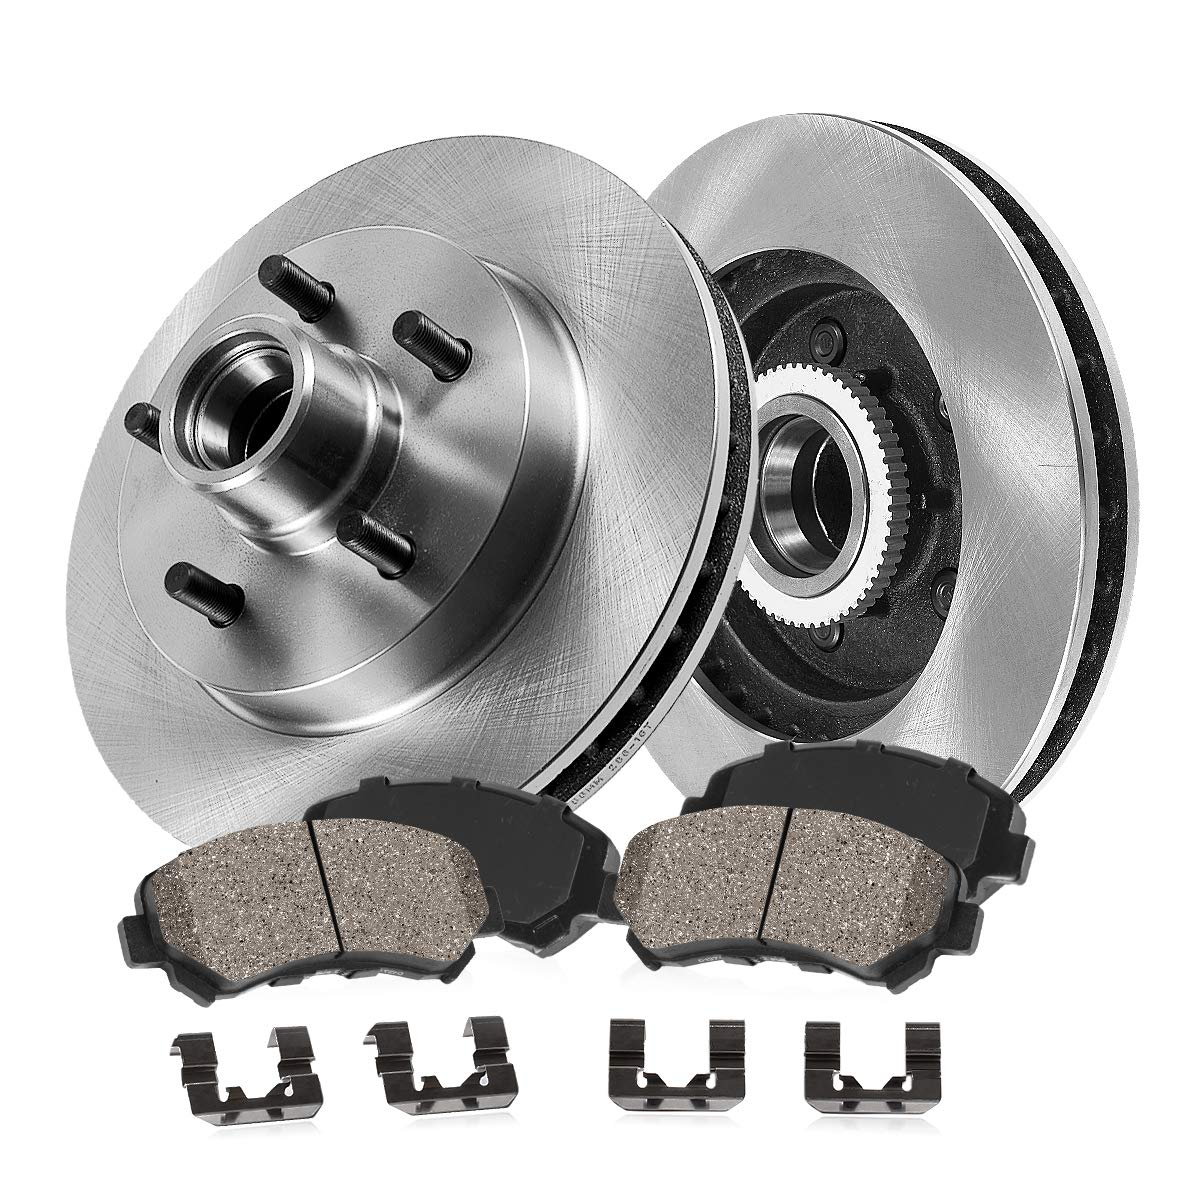 [ RWD Pickup SUV Series ] FRONT 286.7 mm Premium OE 5 Lug [2] Brake Disc Rotors + [4] Ceramic Brake Pads + Clips Callahan Brake Parts